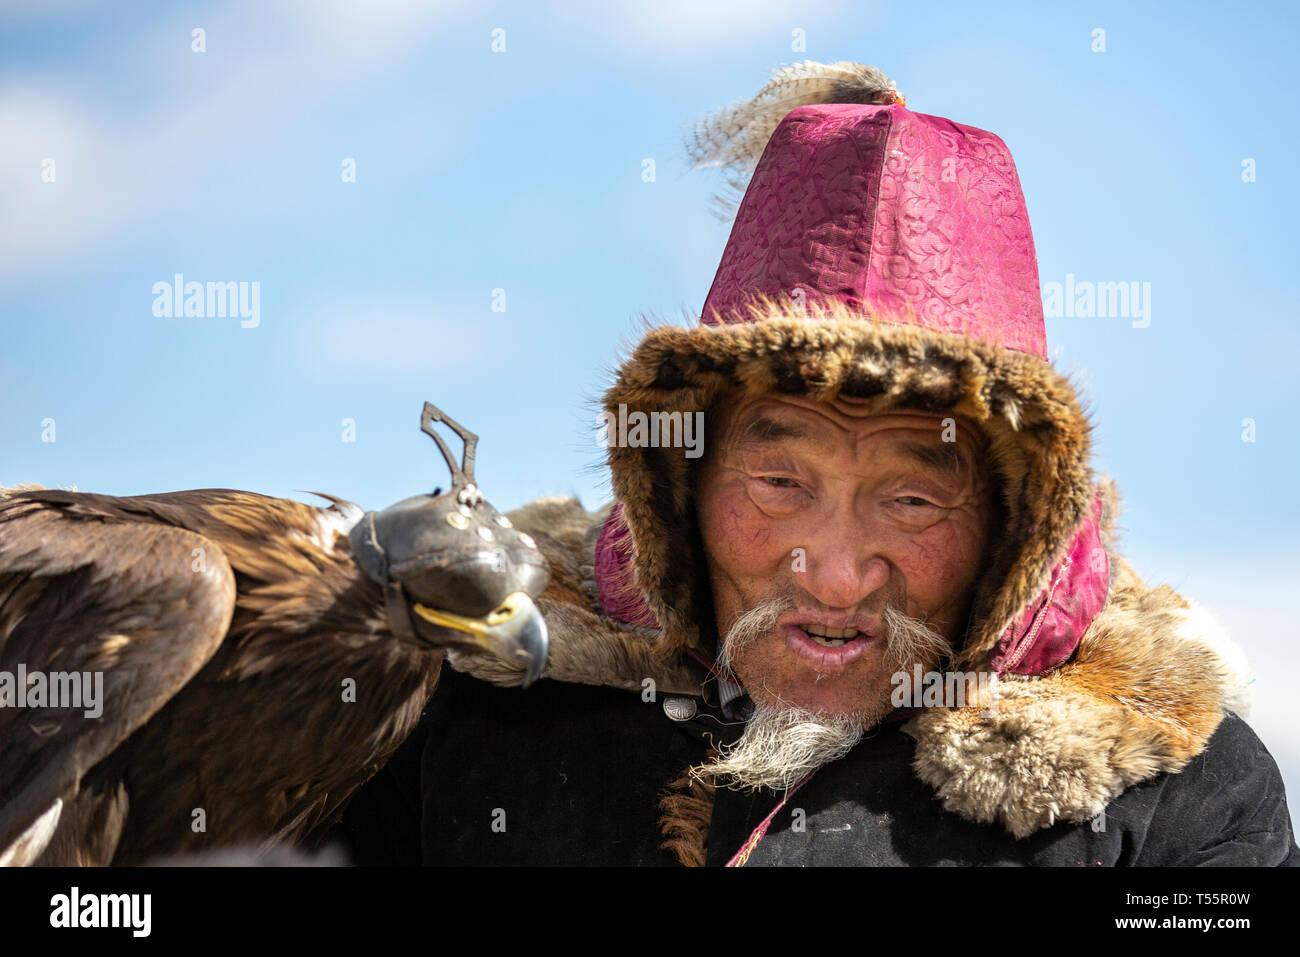 bayan-ulgii-mongolia-3rd-october-2015-ka